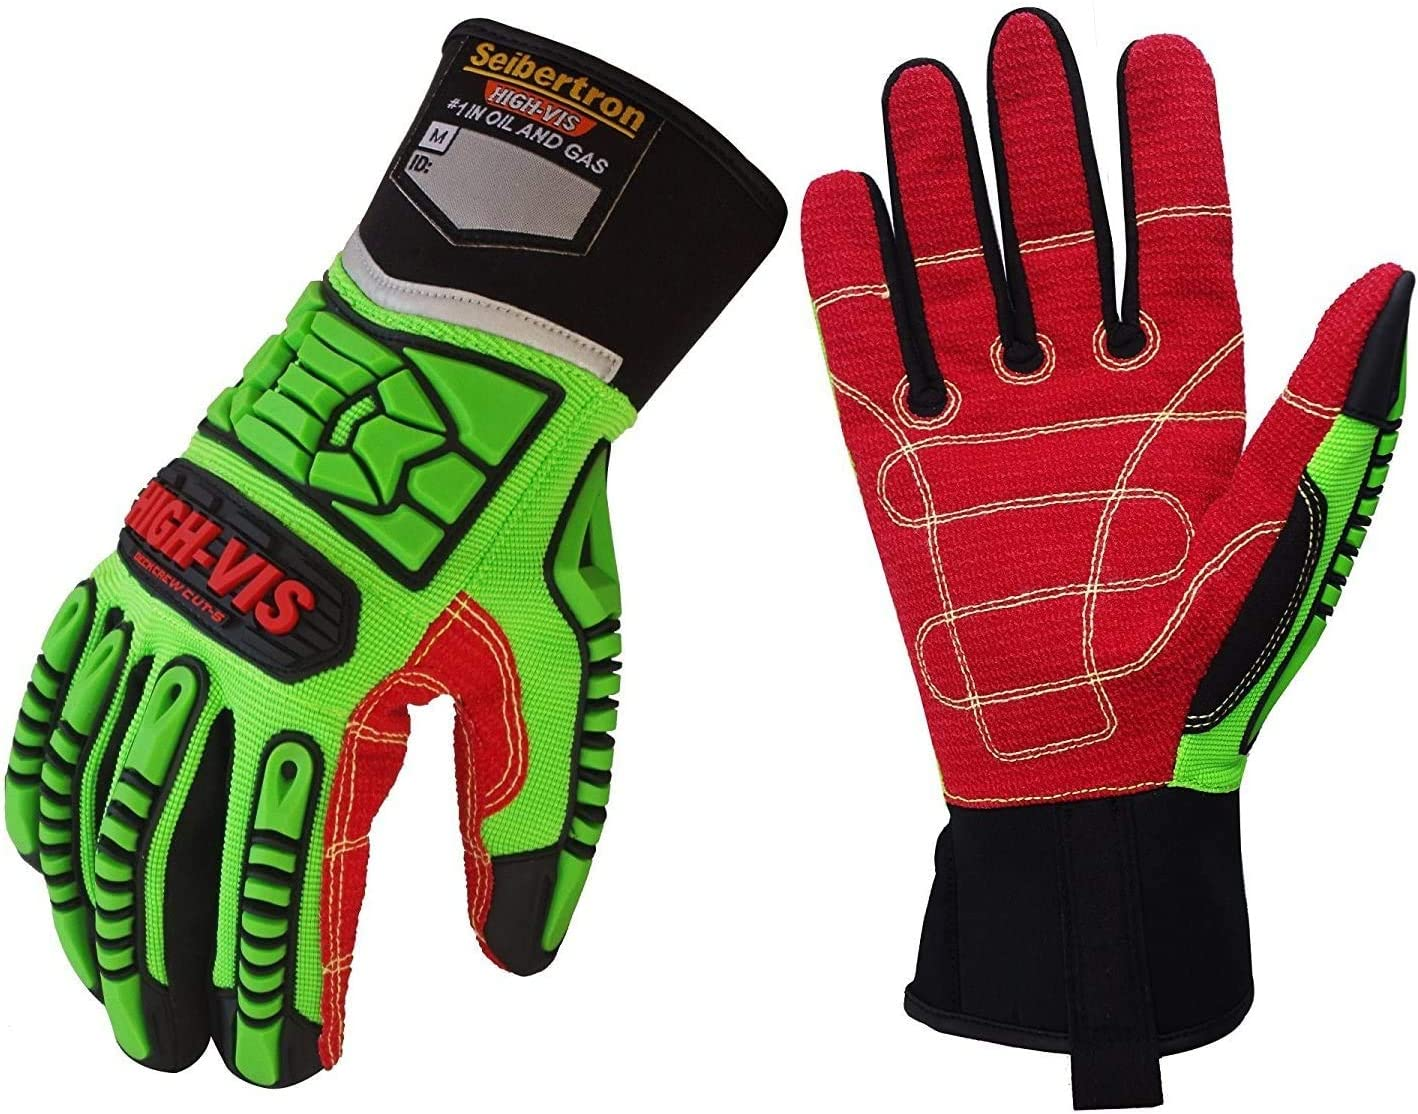 Seibertron HIGH-VIS HDC5 Level Raleigh Mall 5 H Deckhand Resistant Gloves Cut Superior